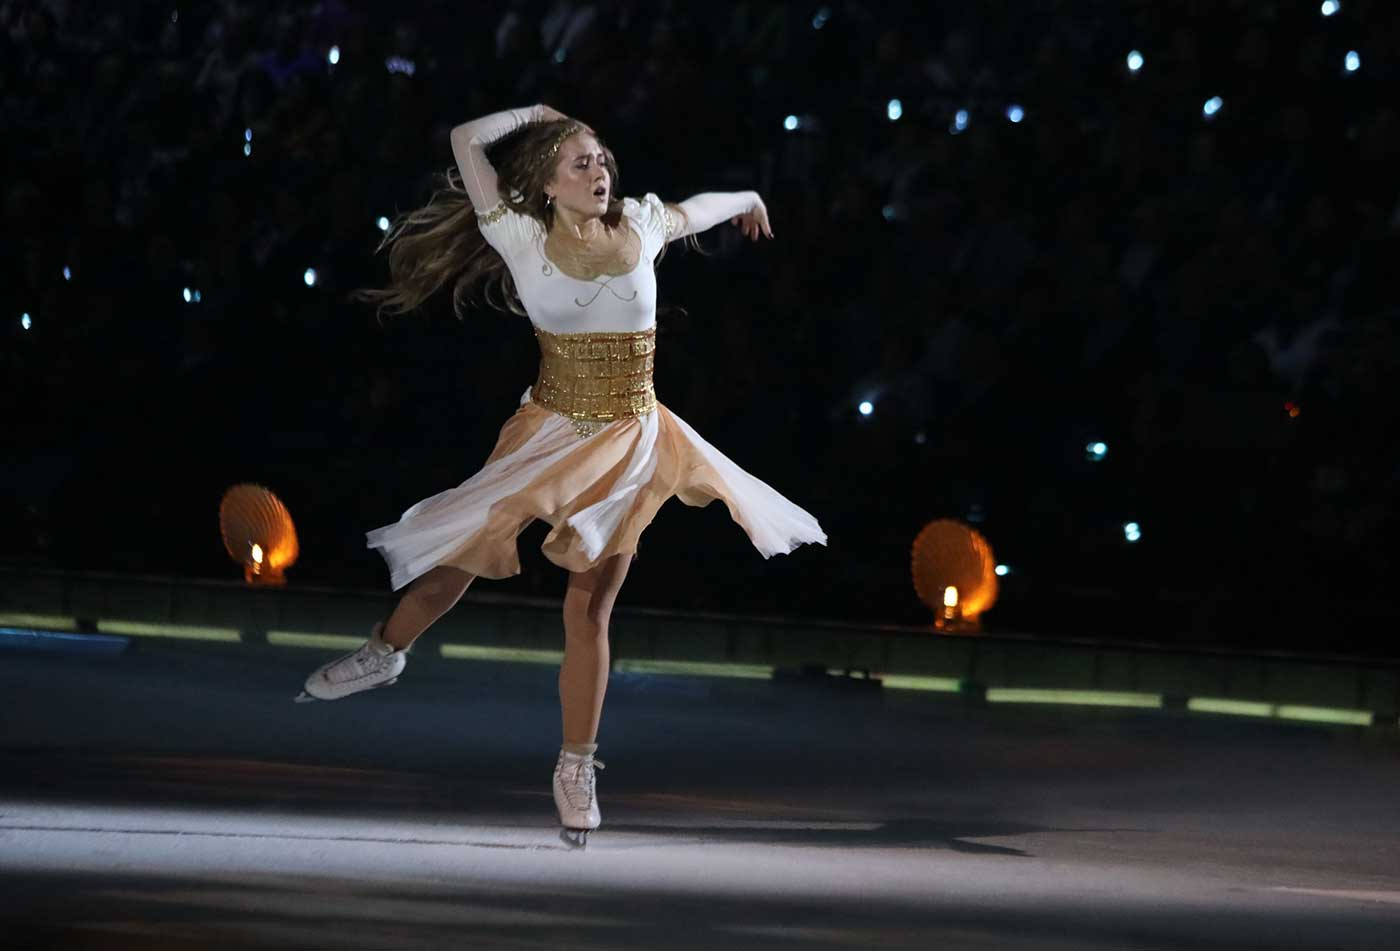 Ледовые шоу-6 - Страница 36 Elena-radionova-2024321